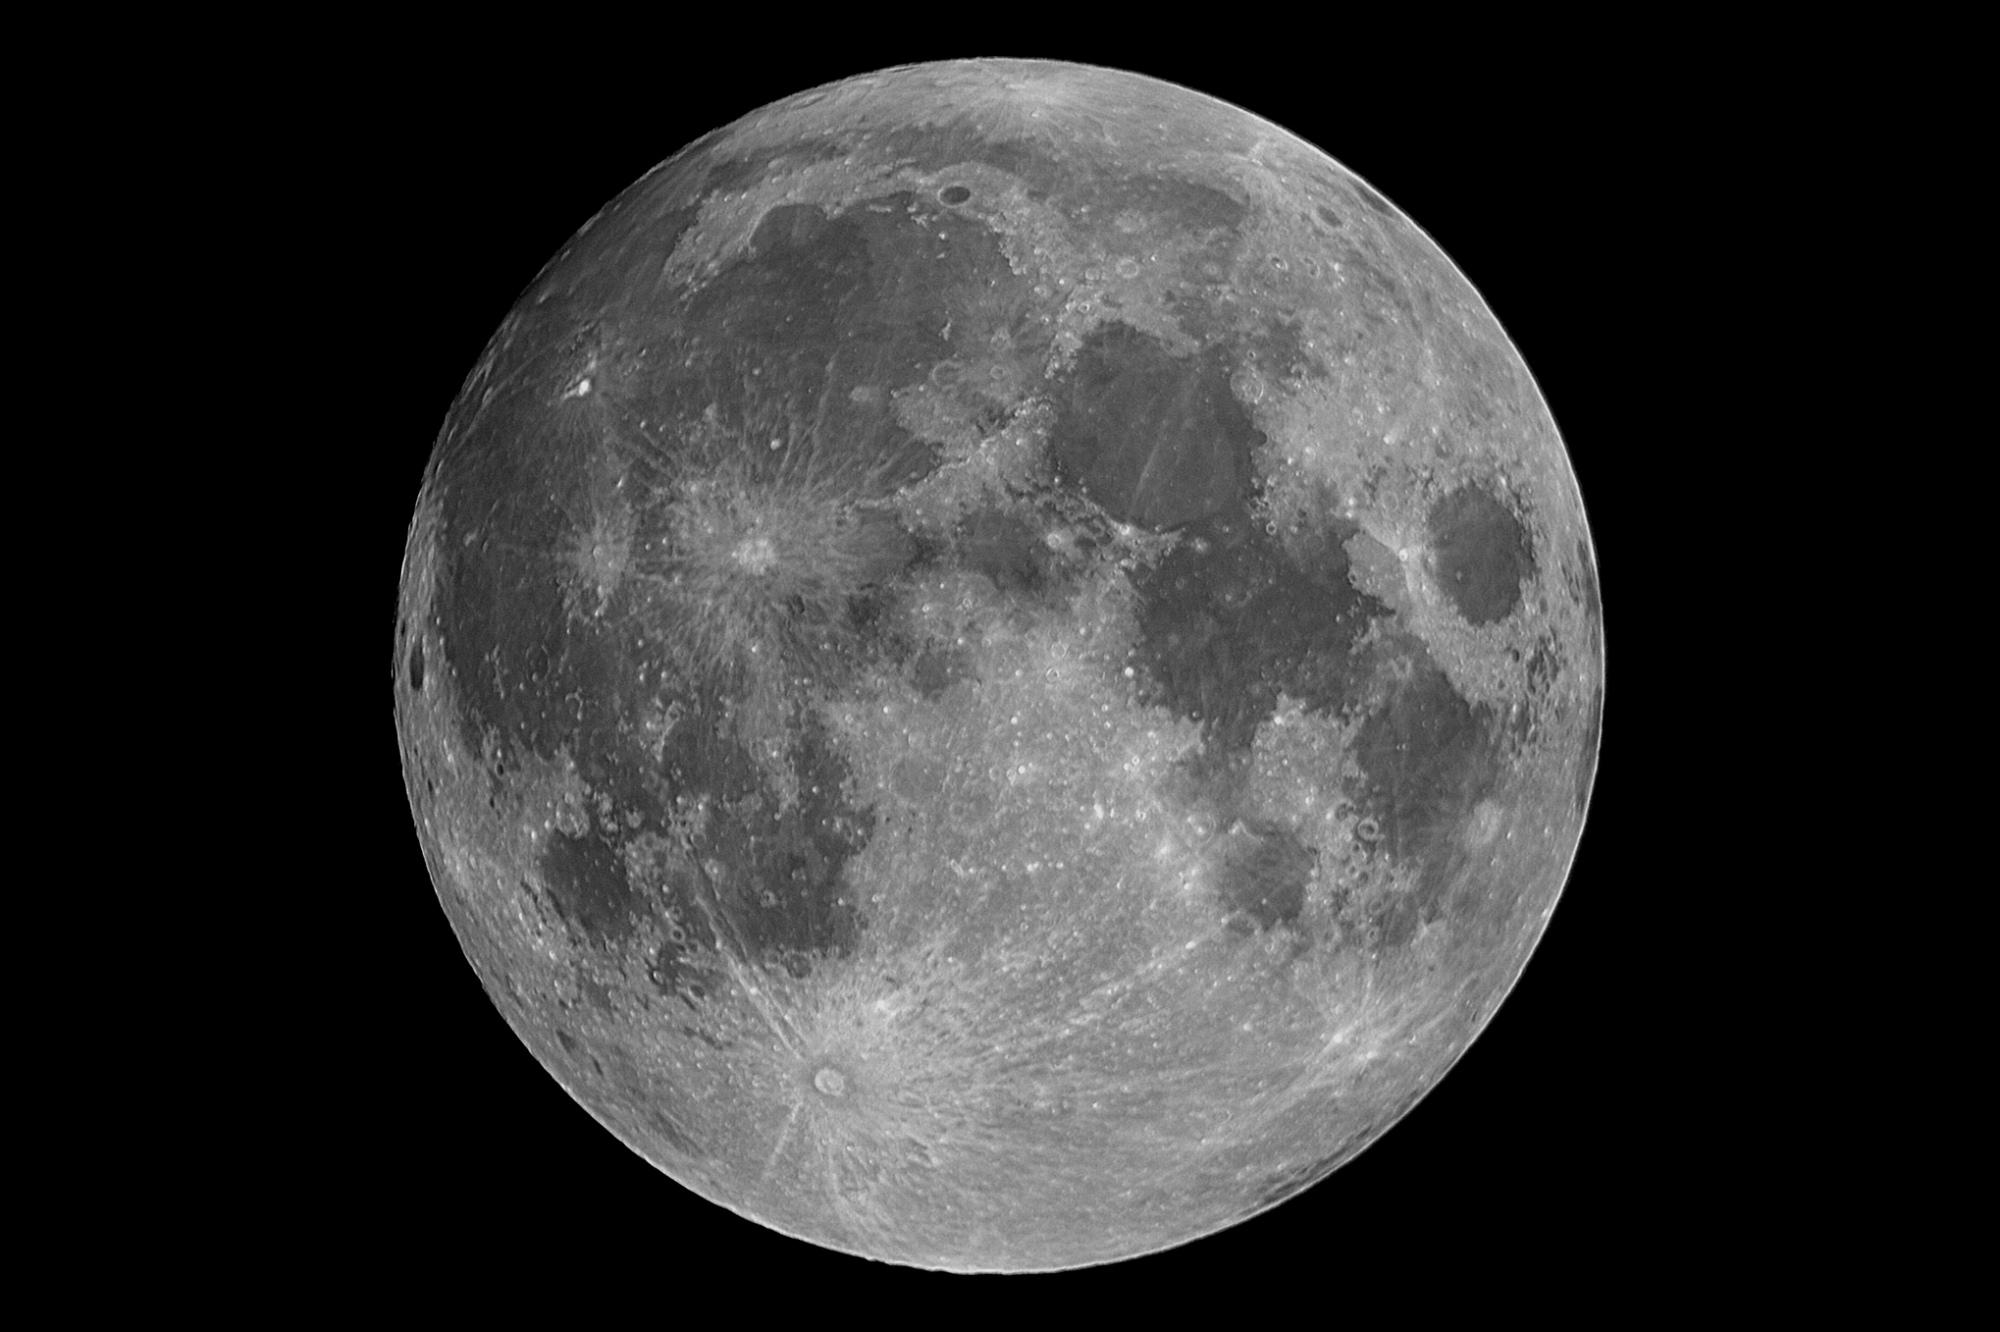 5f037ec68f5da_01-LUNE_99_2020-07-04_astrosurface_lune_100r__35_reg_09.thumb.jpg.bdbf015f91a523d289c569aa7b01acc7.jpg